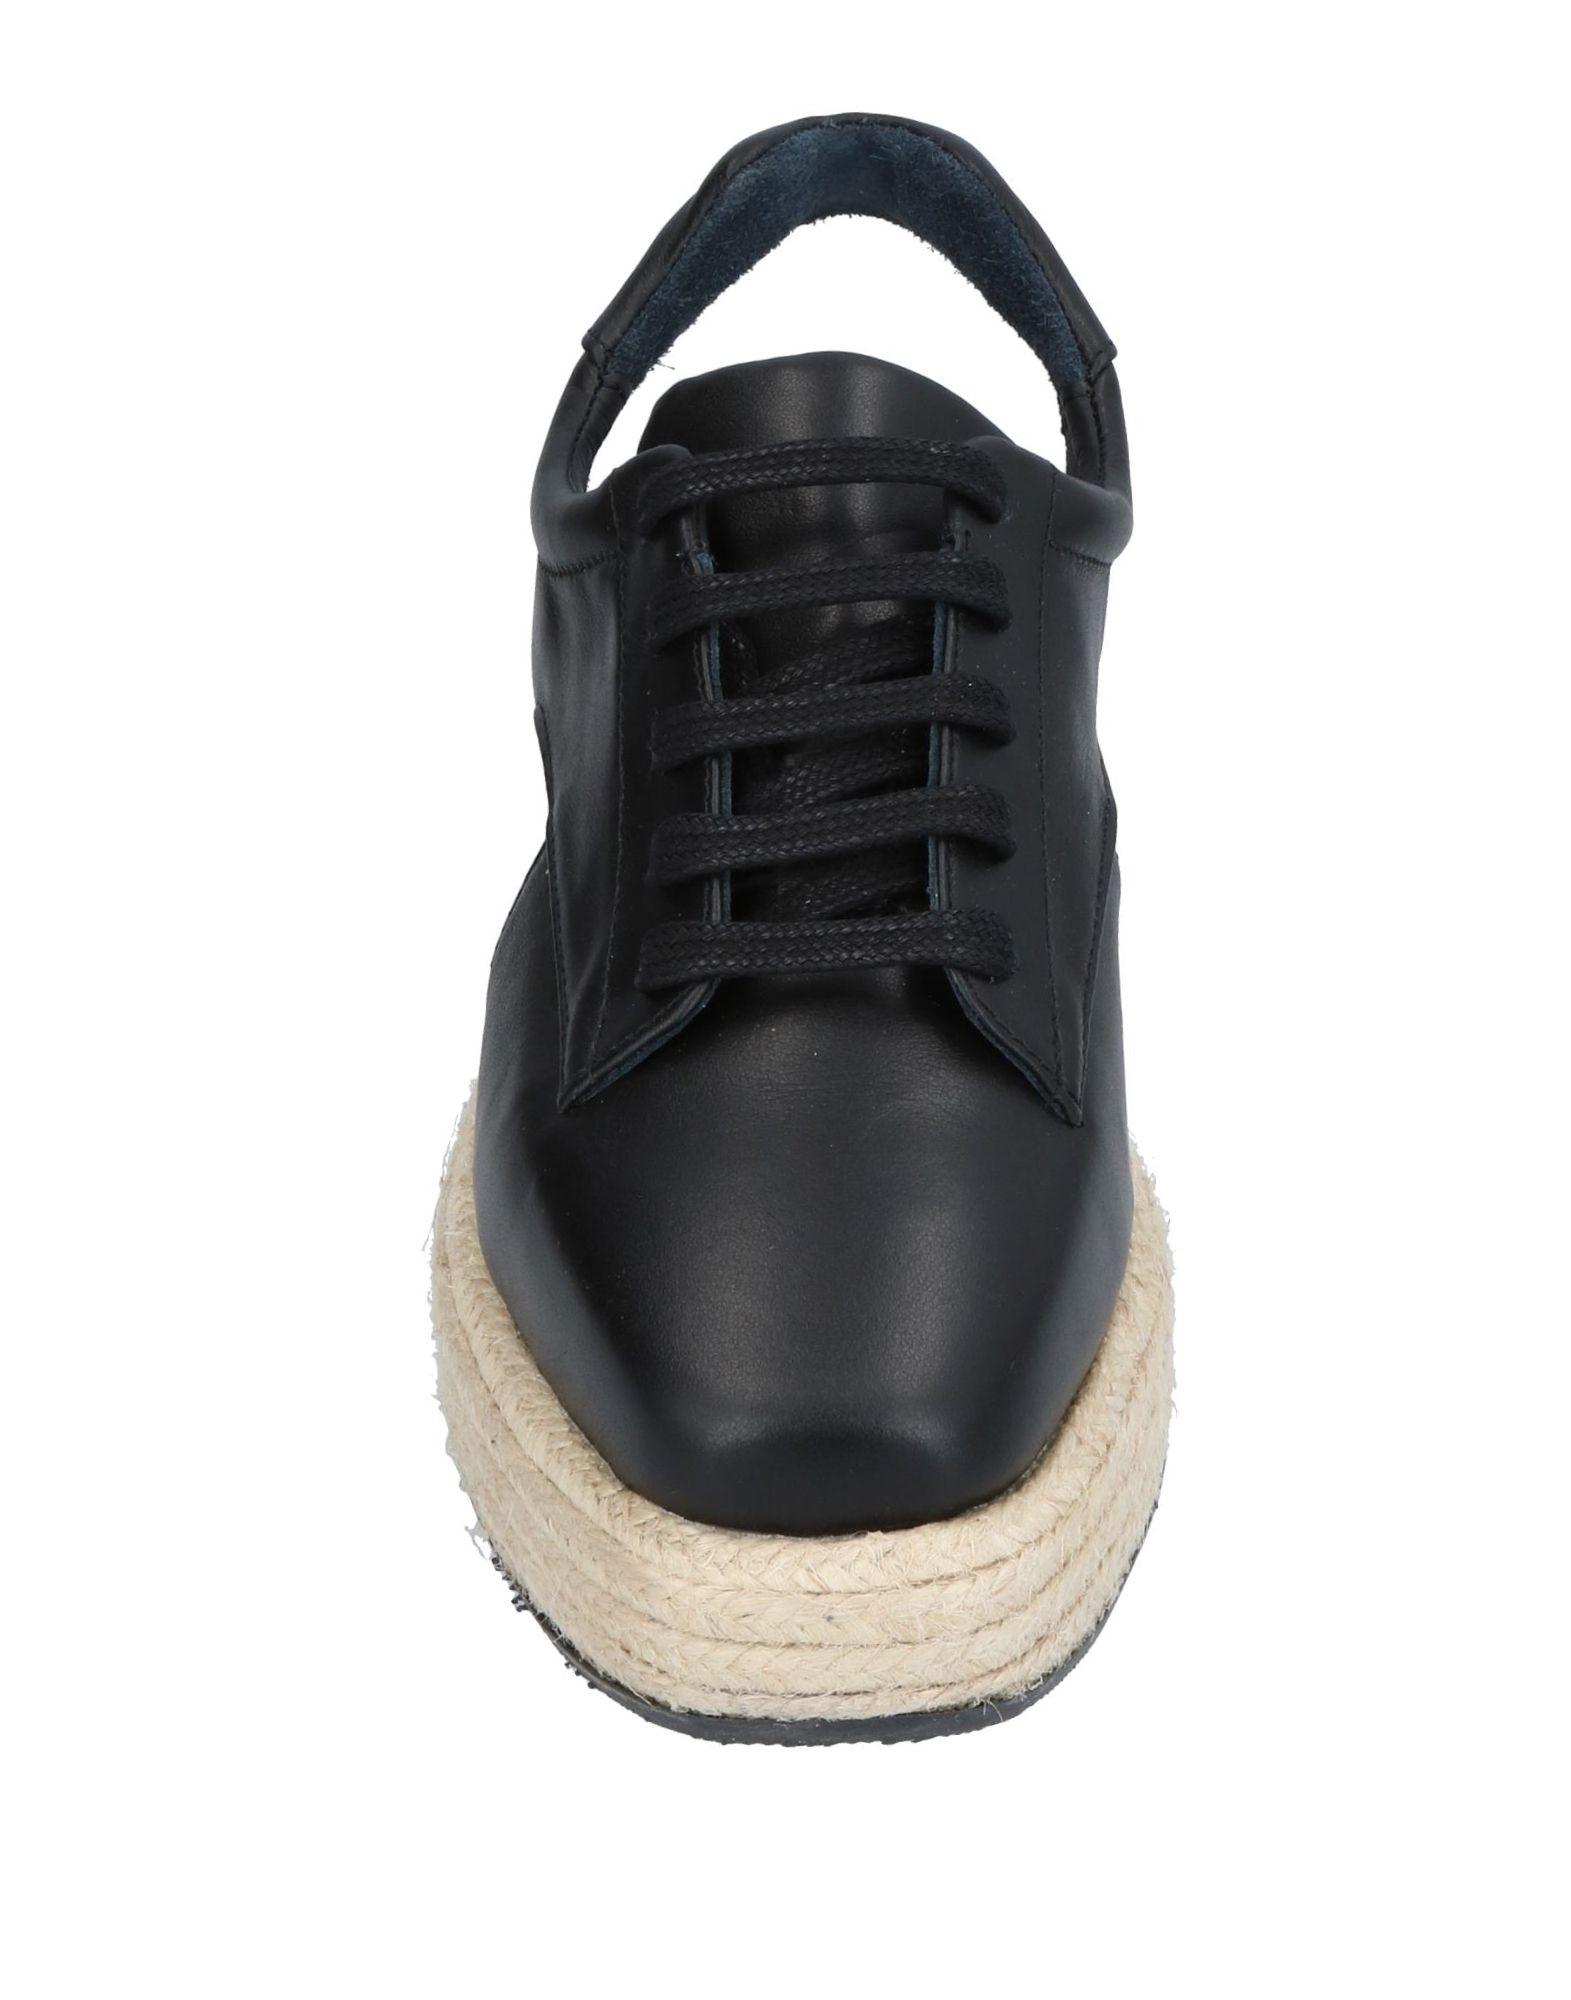 Manuel Barceló Espadrilles Damen  11332050FM Gute Qualität beliebte Schuhe